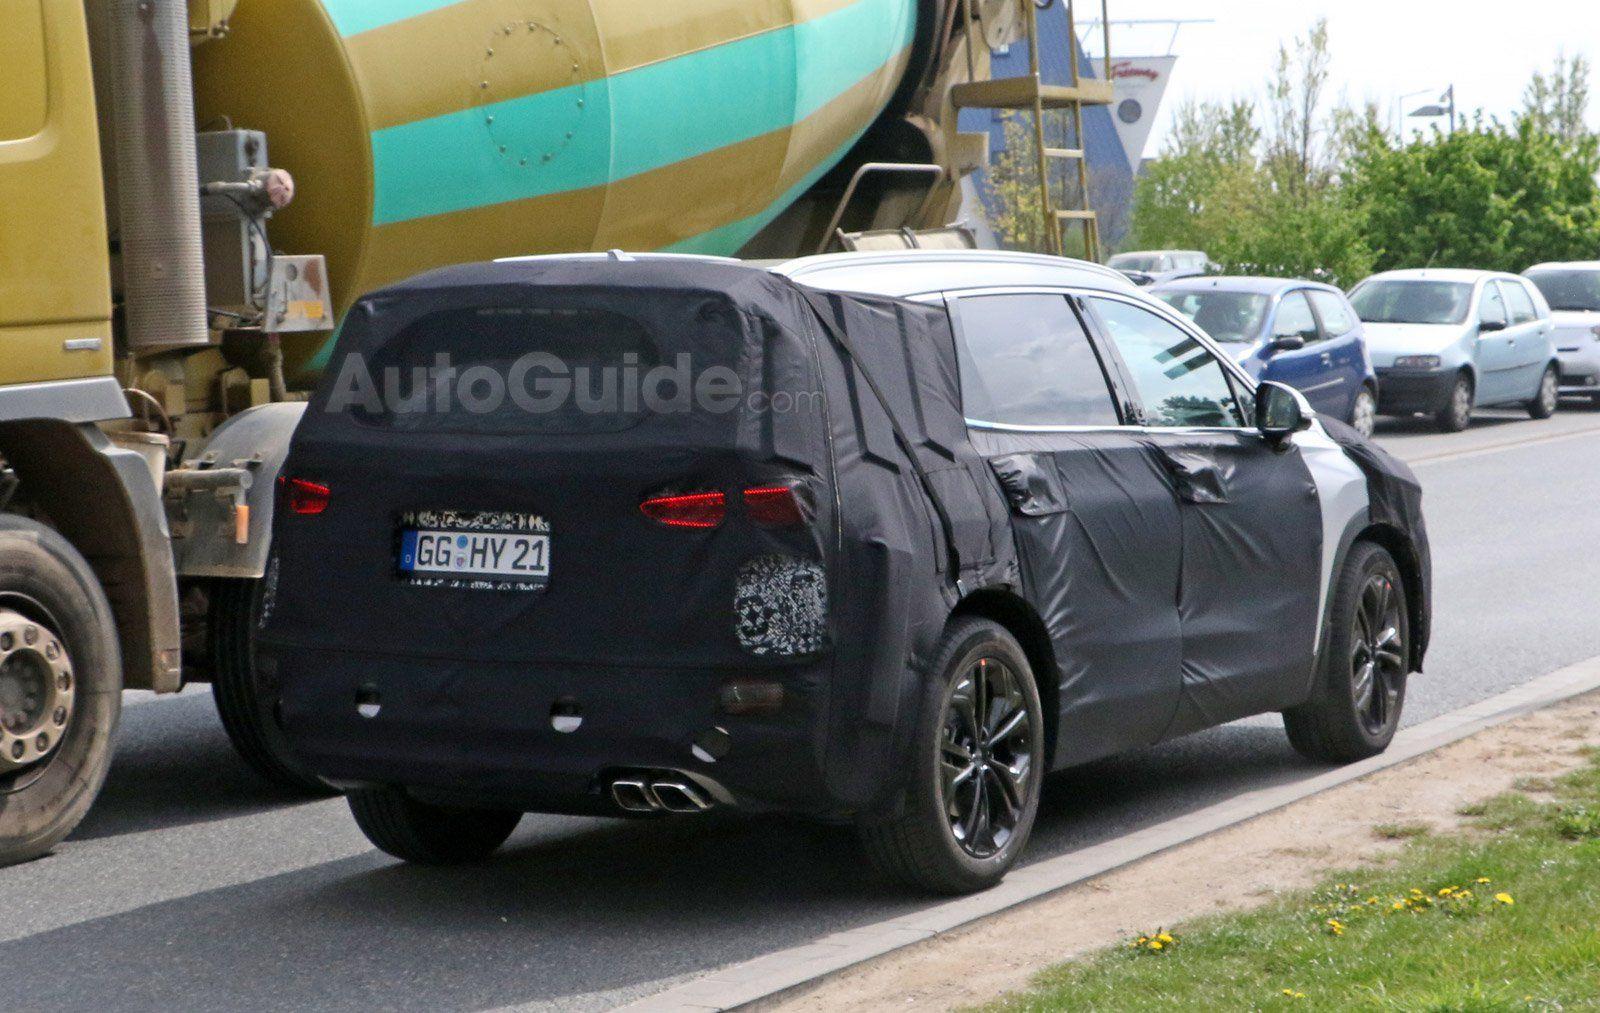 2019 Hyundai Santa Fe rear view